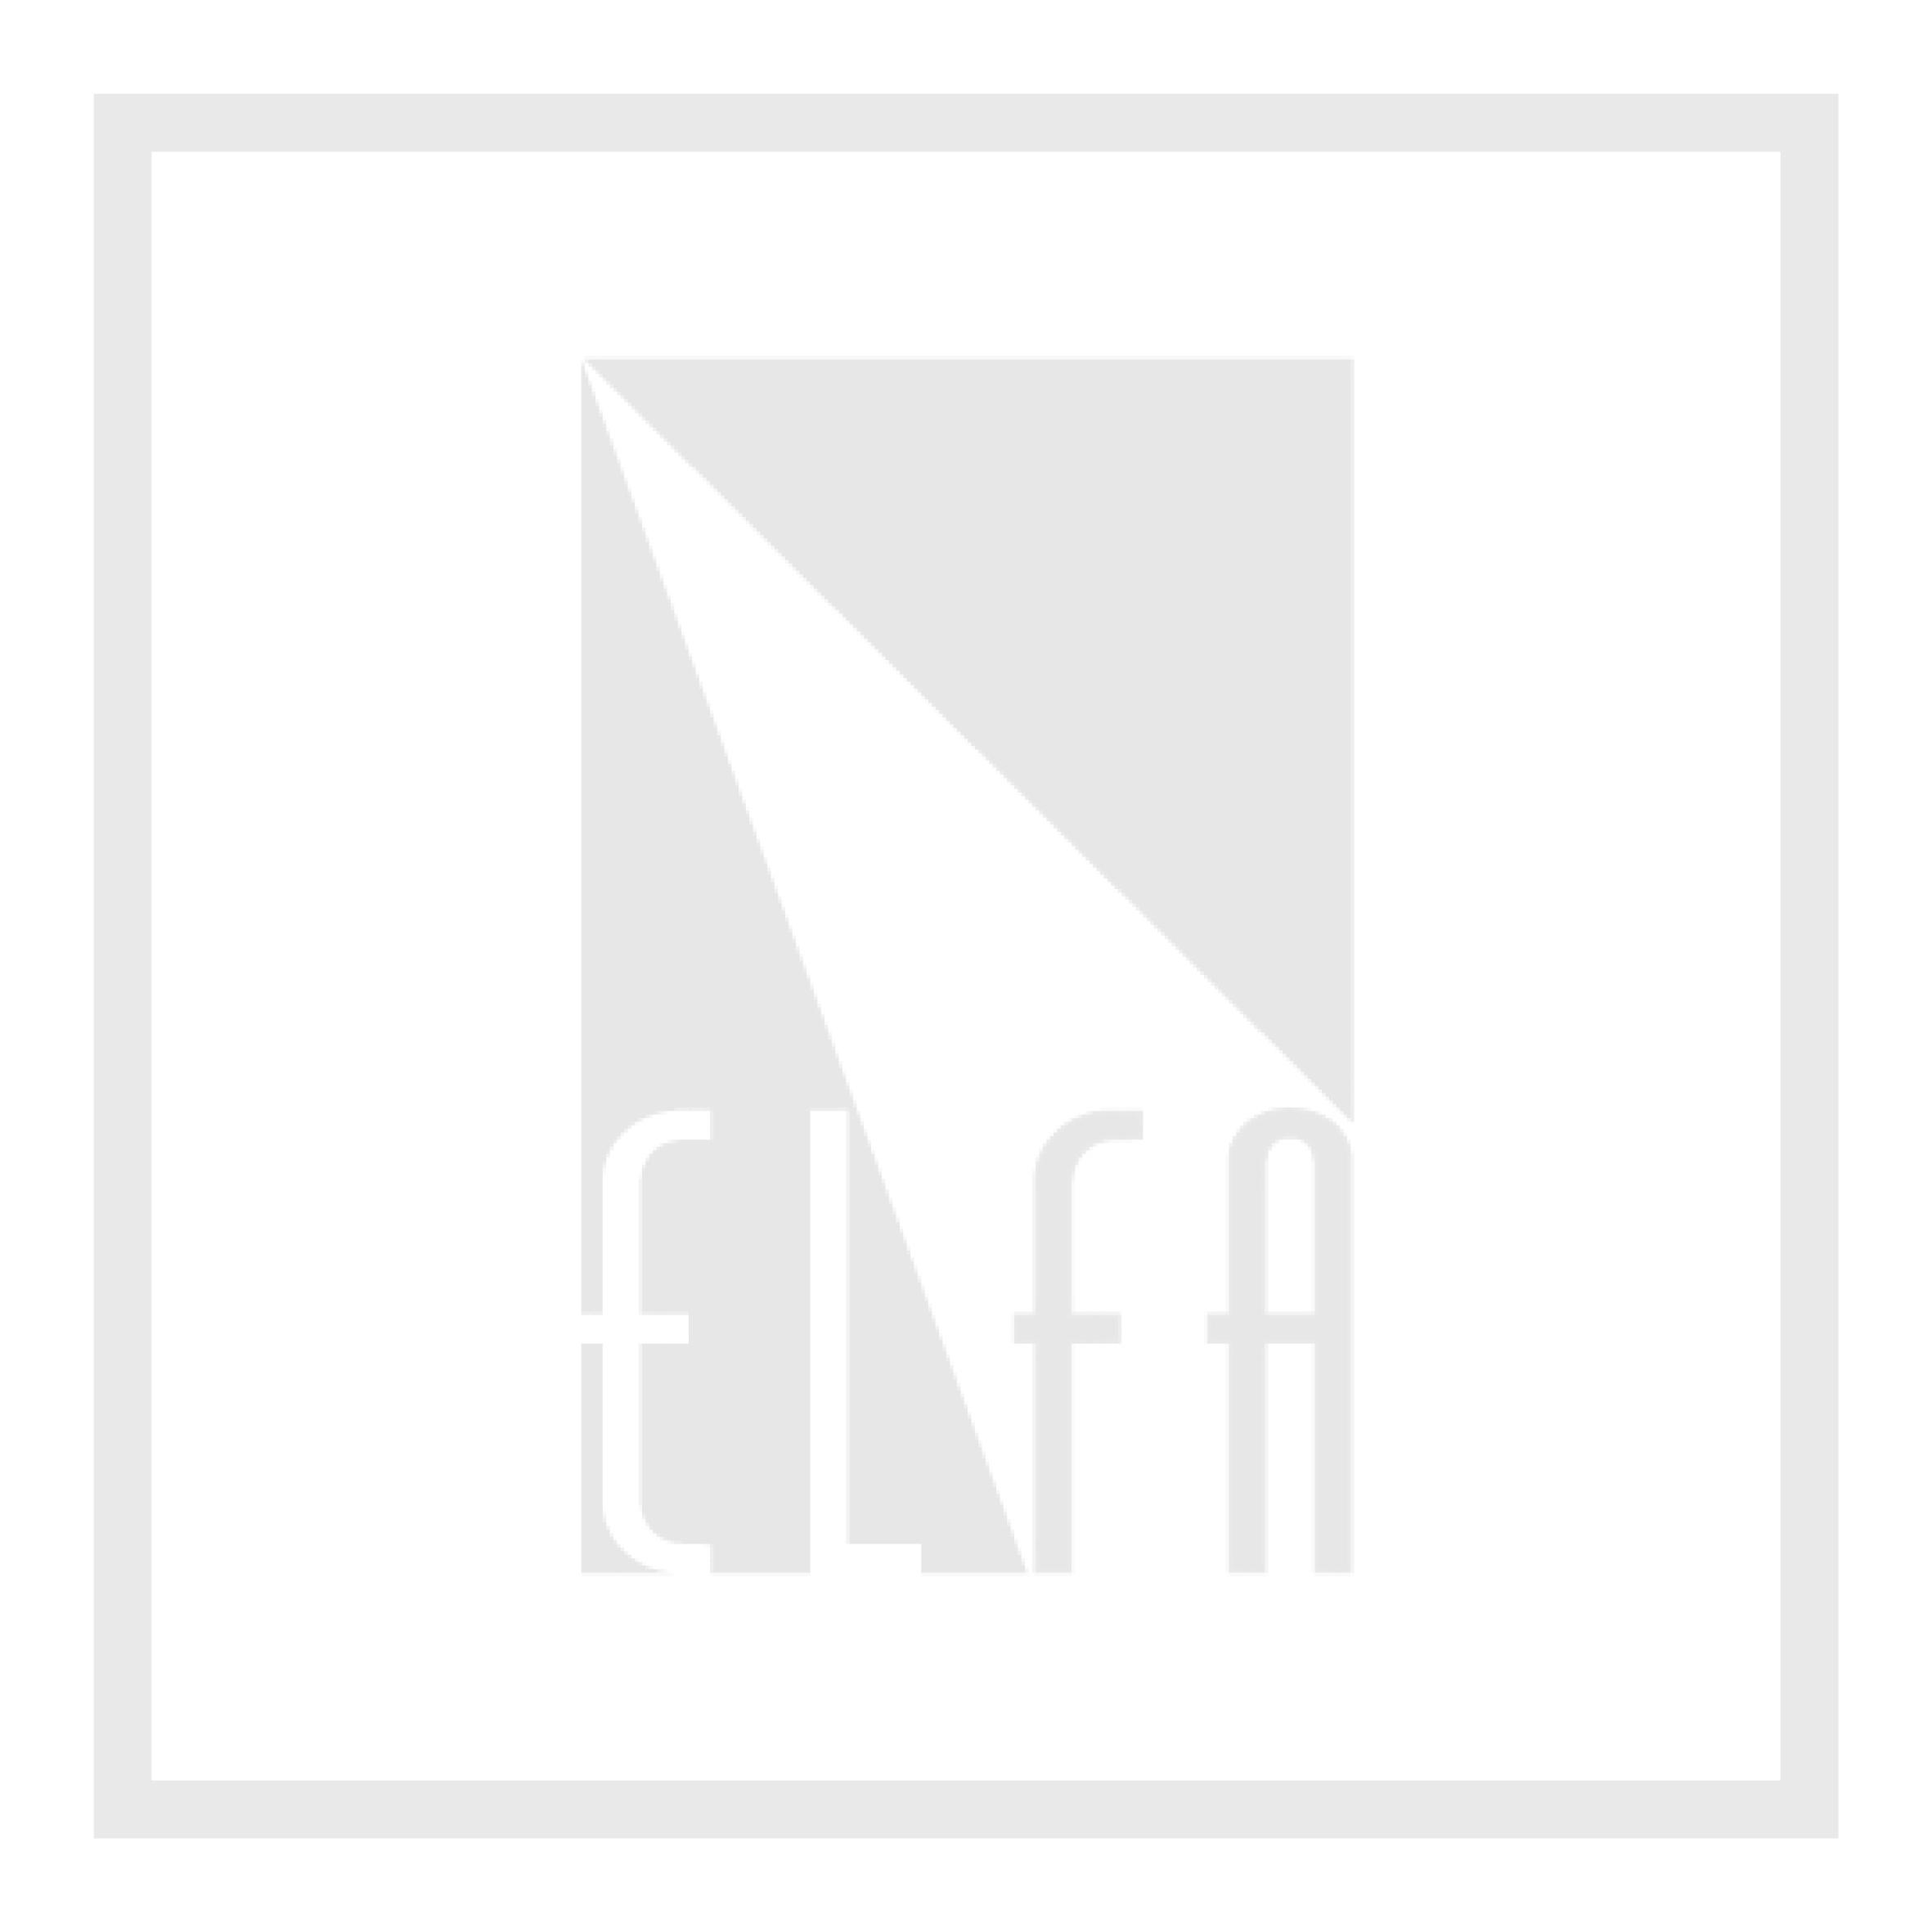 Maglite NiMH batt pack MagCharger private label 3500mAh